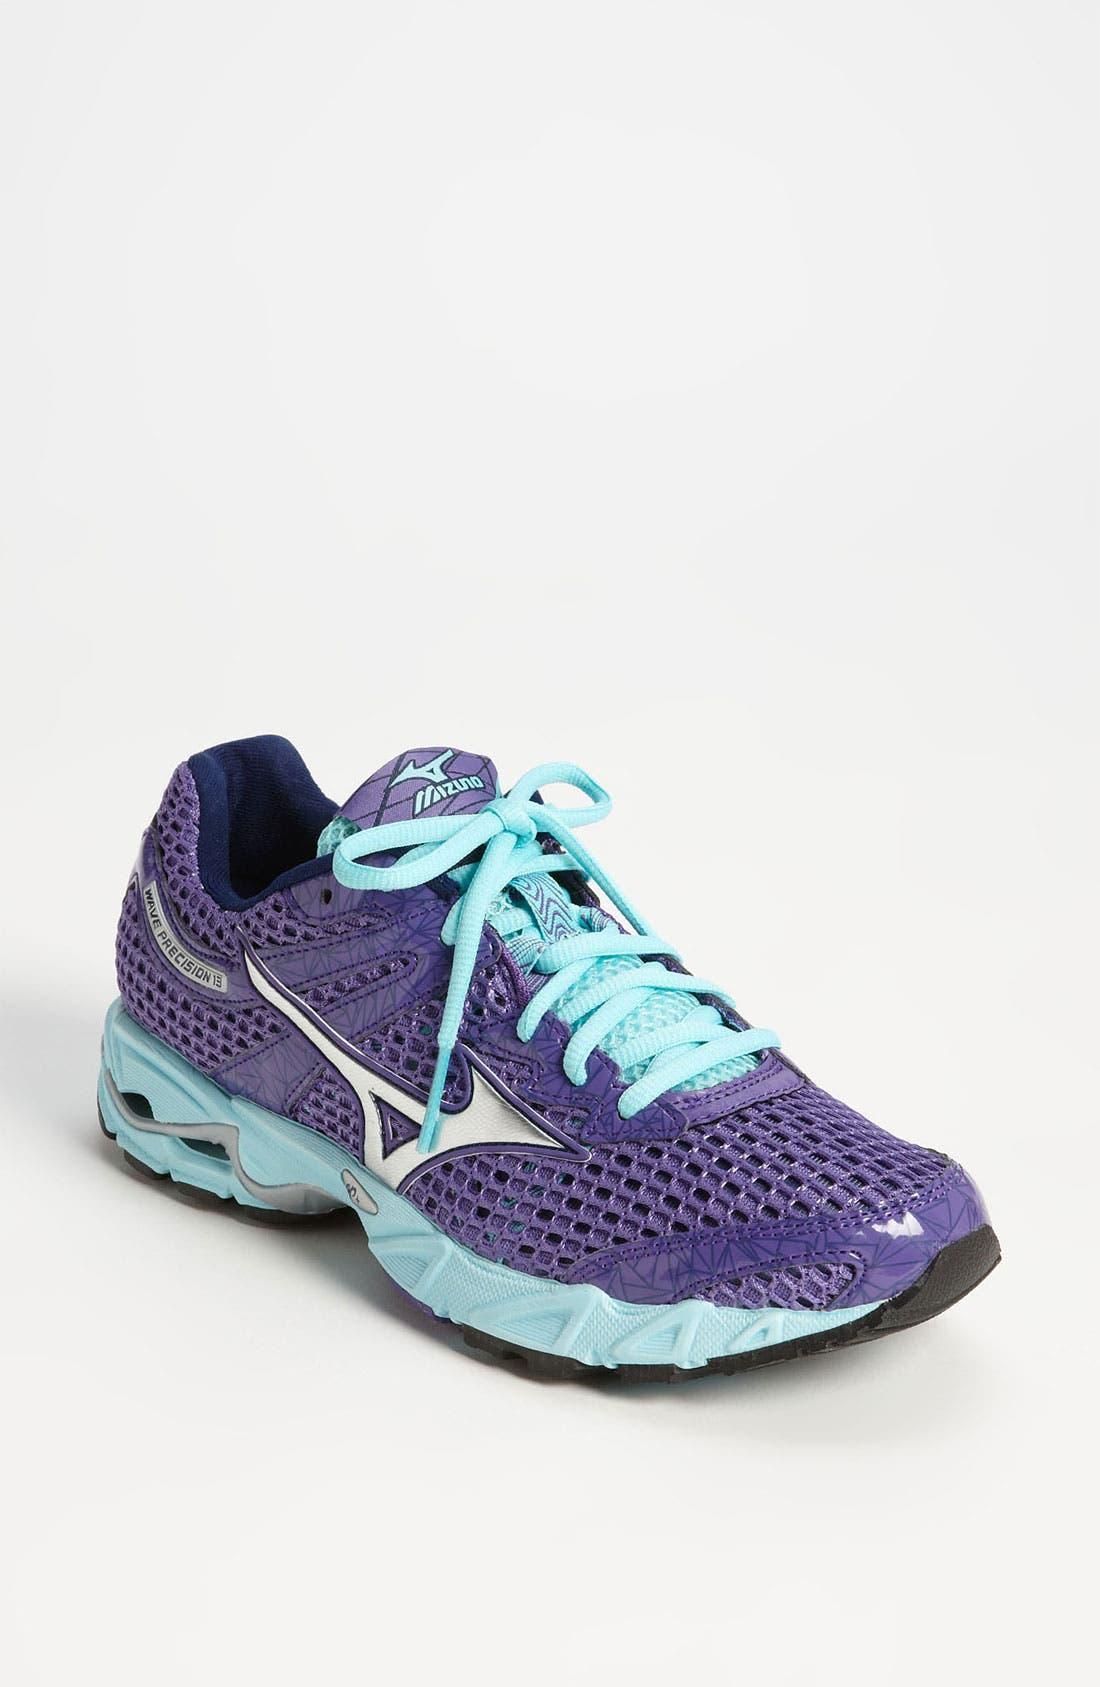 Main Image - Mizuno 'Wave Precision 13' Running Shoe (Women)(Retail Price: $109.95)